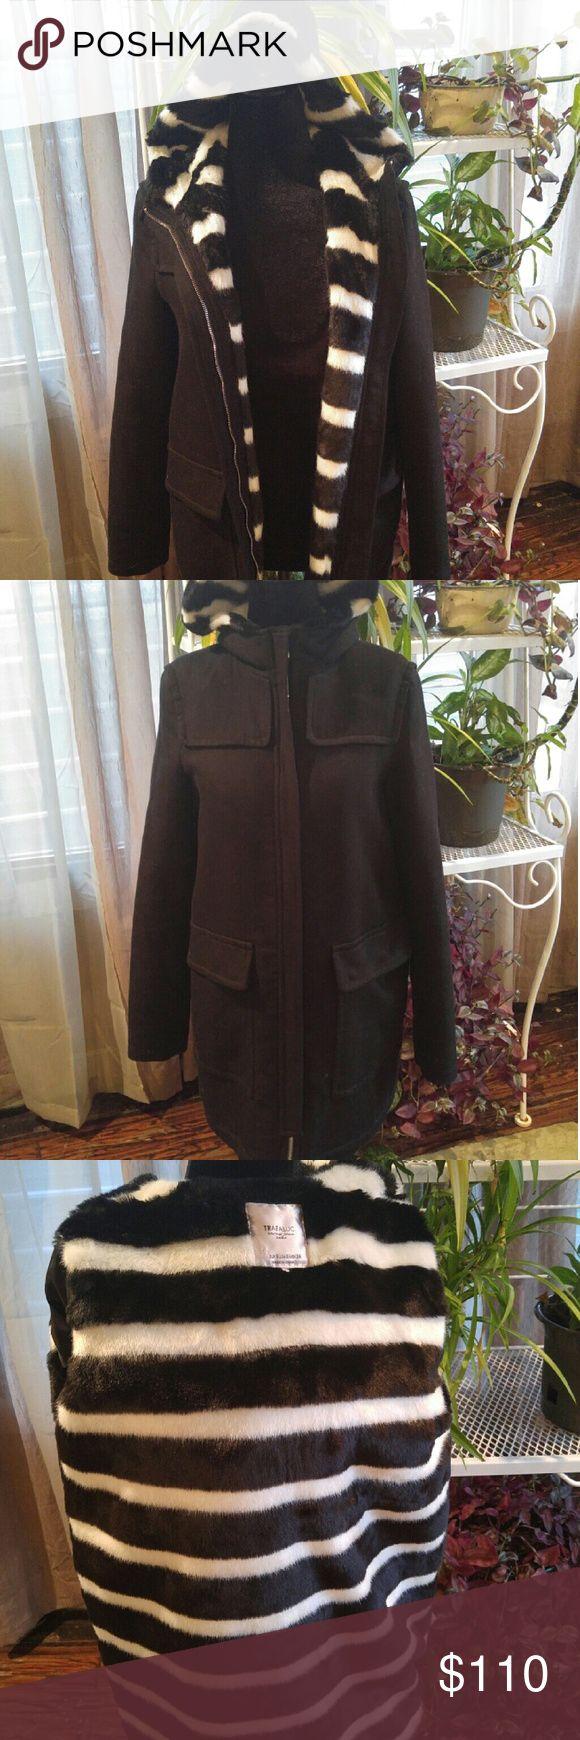 Best 25  Zara winter jacket ideas on Pinterest | Zara winter coats ...